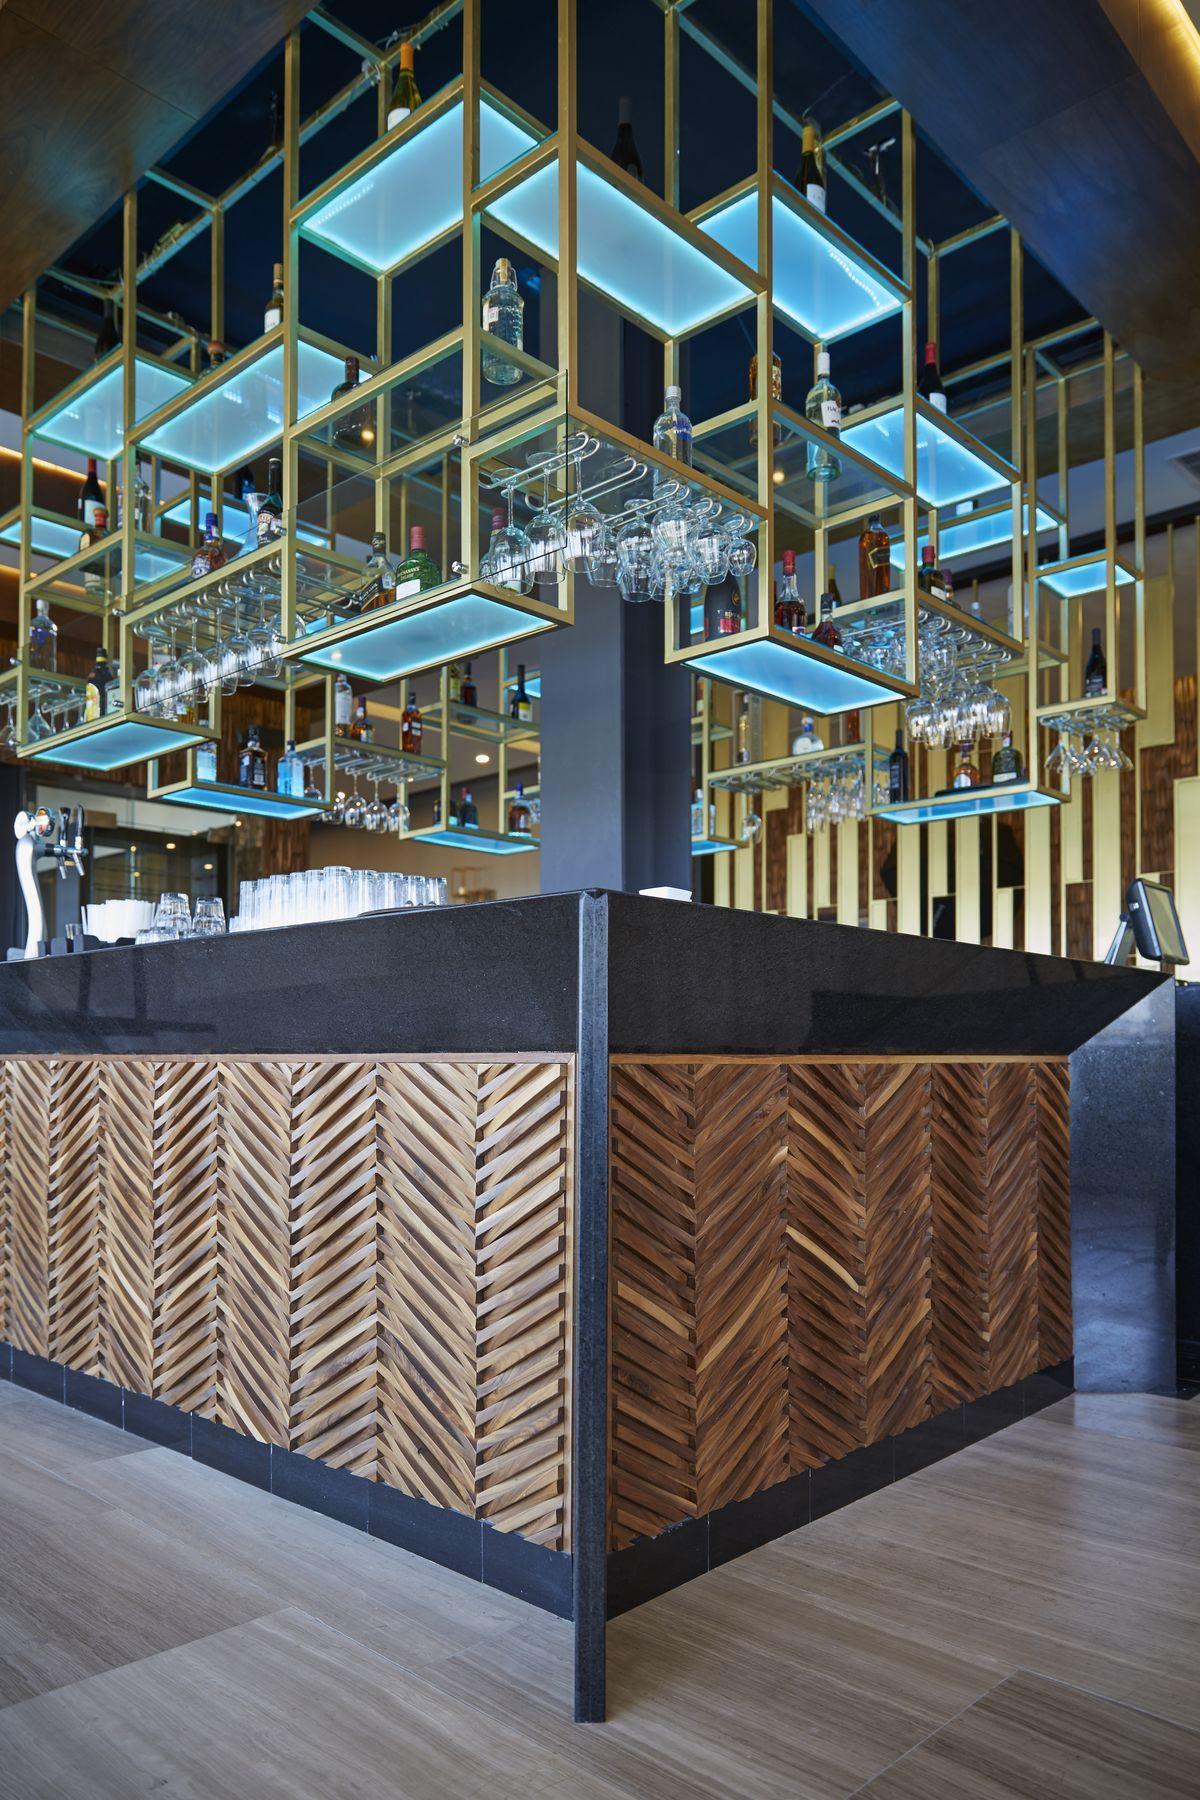 restaurant supply chairs french bistro cb480b505f4190fbc98dc7ed3f53b51b.jpg (1200×1800) | hotel bars & clubs pinterest bar ...